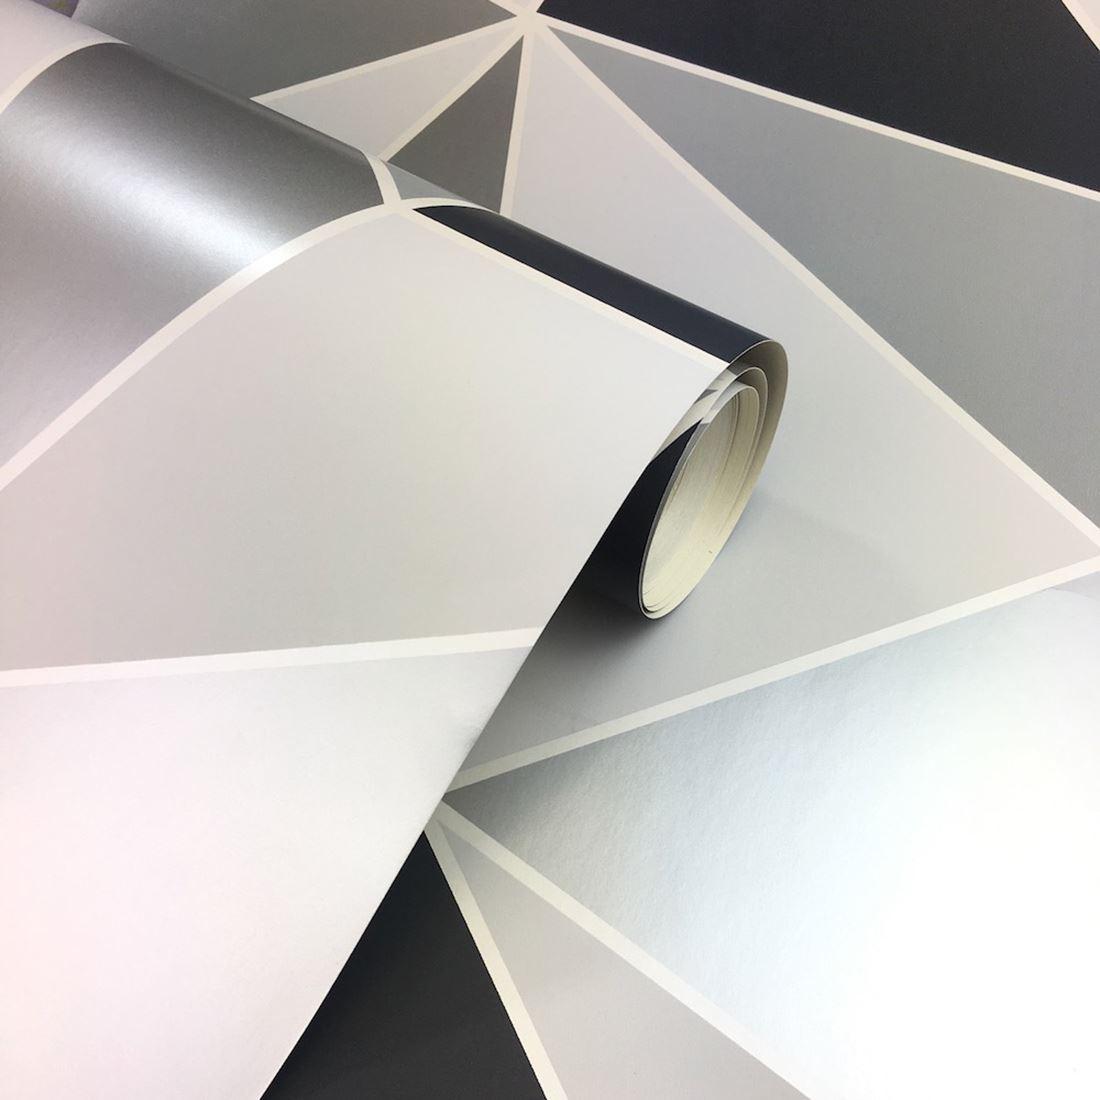 miniatura 6 - Carta da Parati Geometrica Arredamento Camera Moderno Vari Disegni e Colori